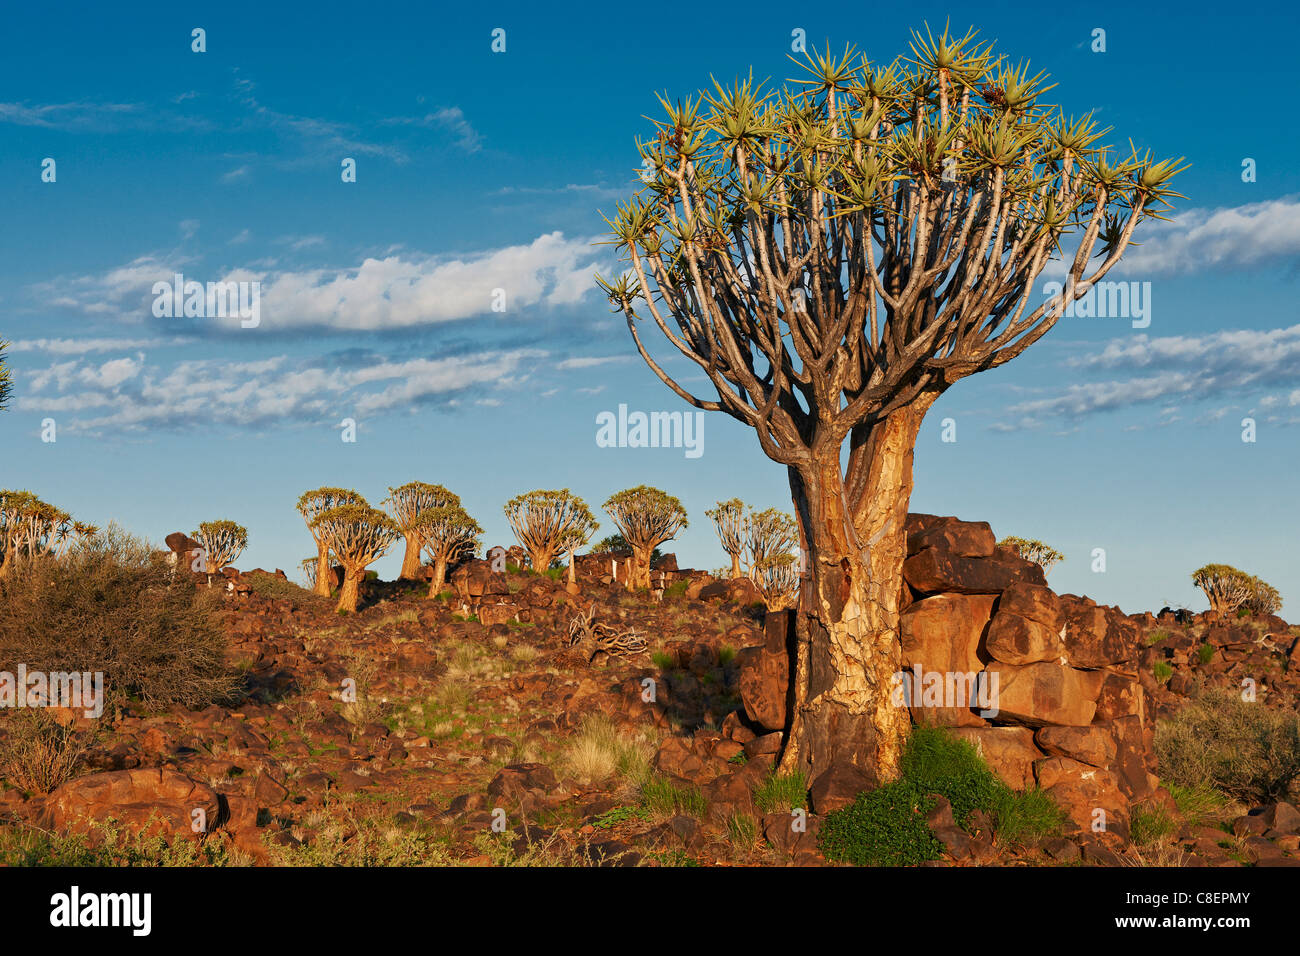 Quiver Tree Forest, L'Aloe dichotoma, ferme Garas, Mesosaurus Fossil Site, Keetmanshoop, Namibie, Afrique Photo Stock